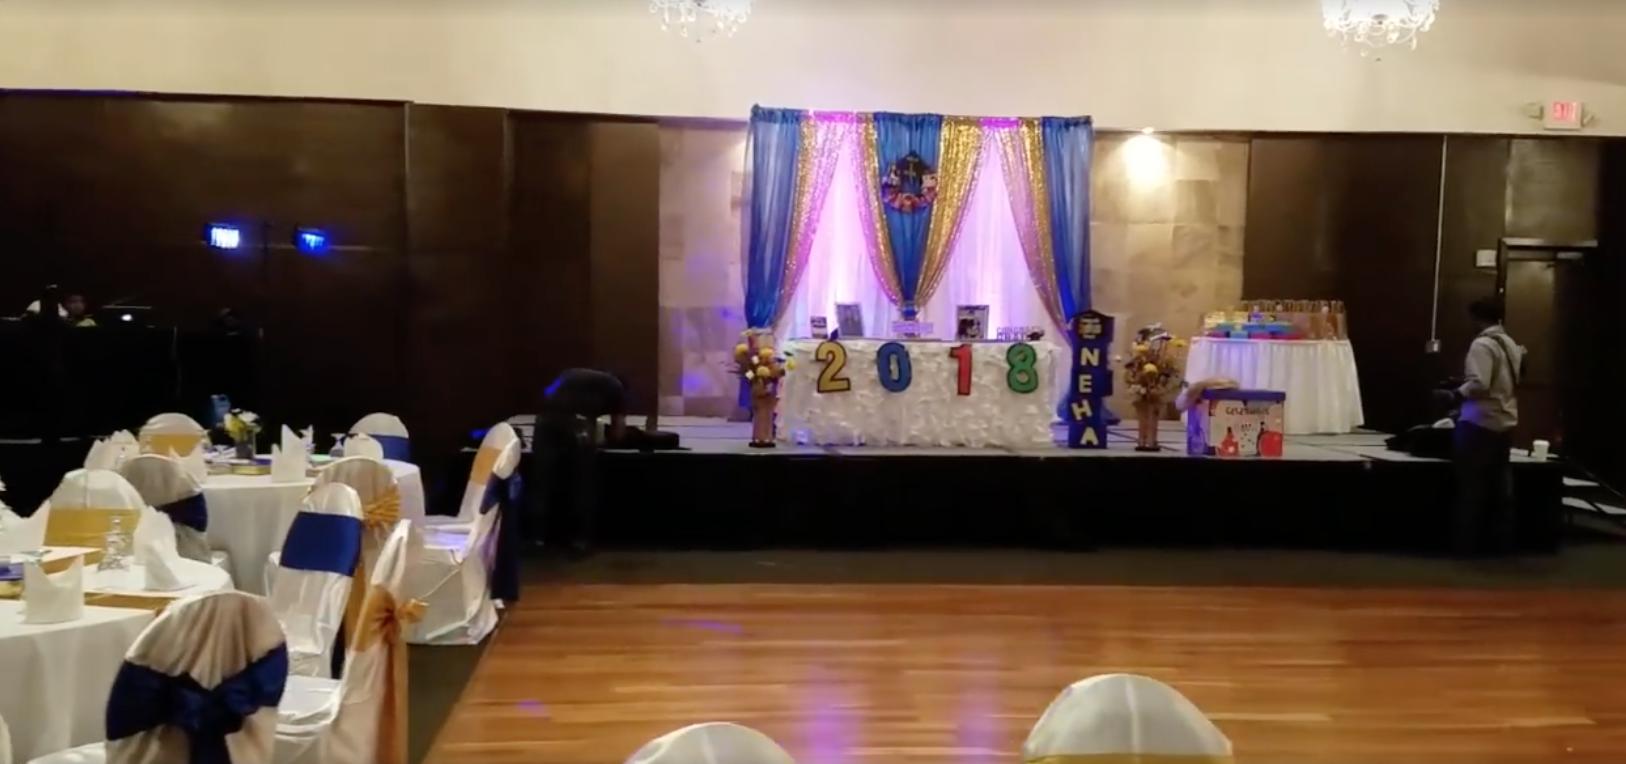 Graduation Party Decor At Tadka Restaurant Alpharetta Anju Events